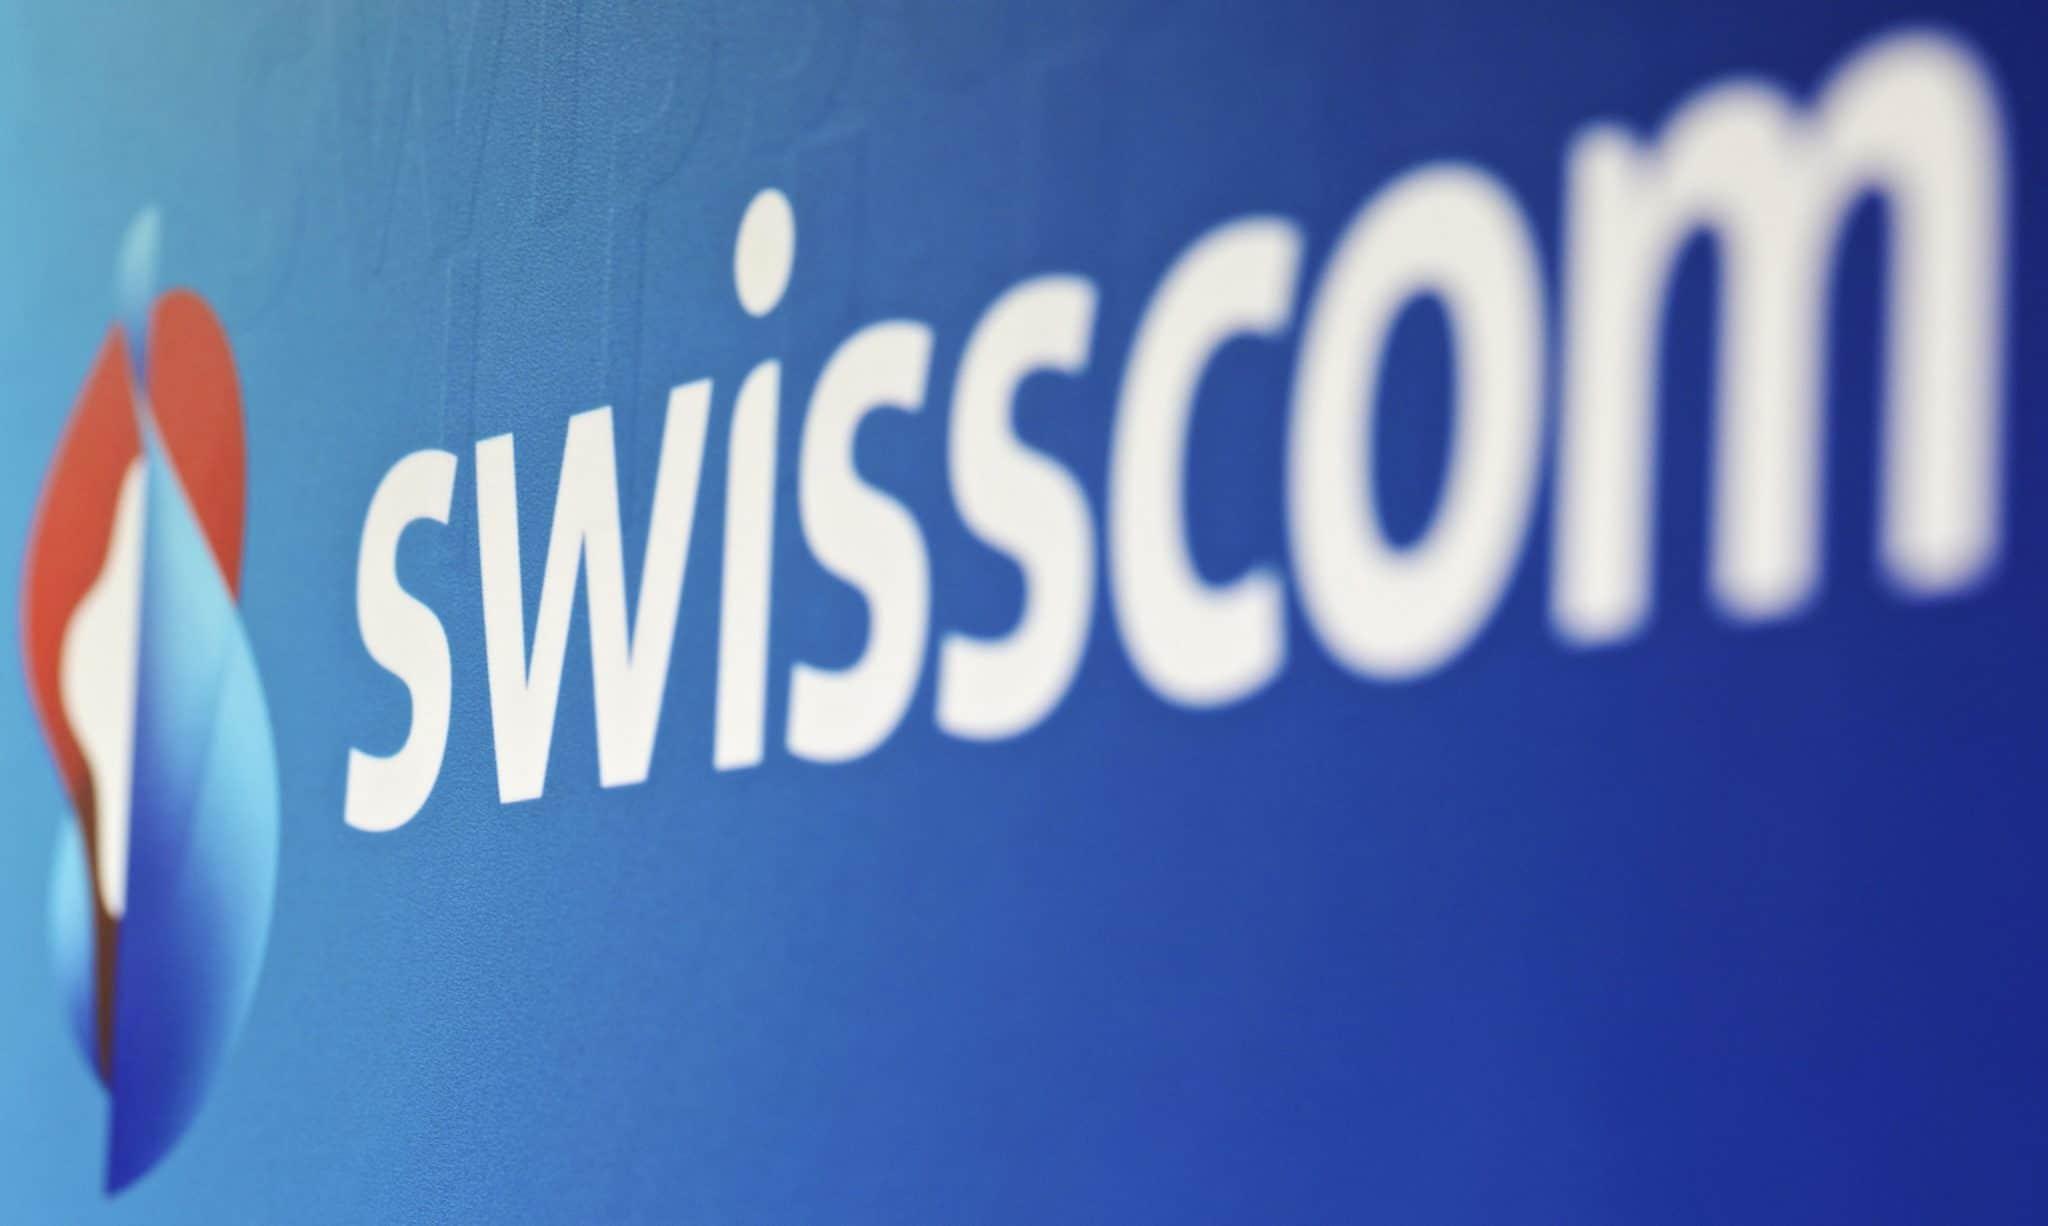 Swisscom supprime 700 emplois